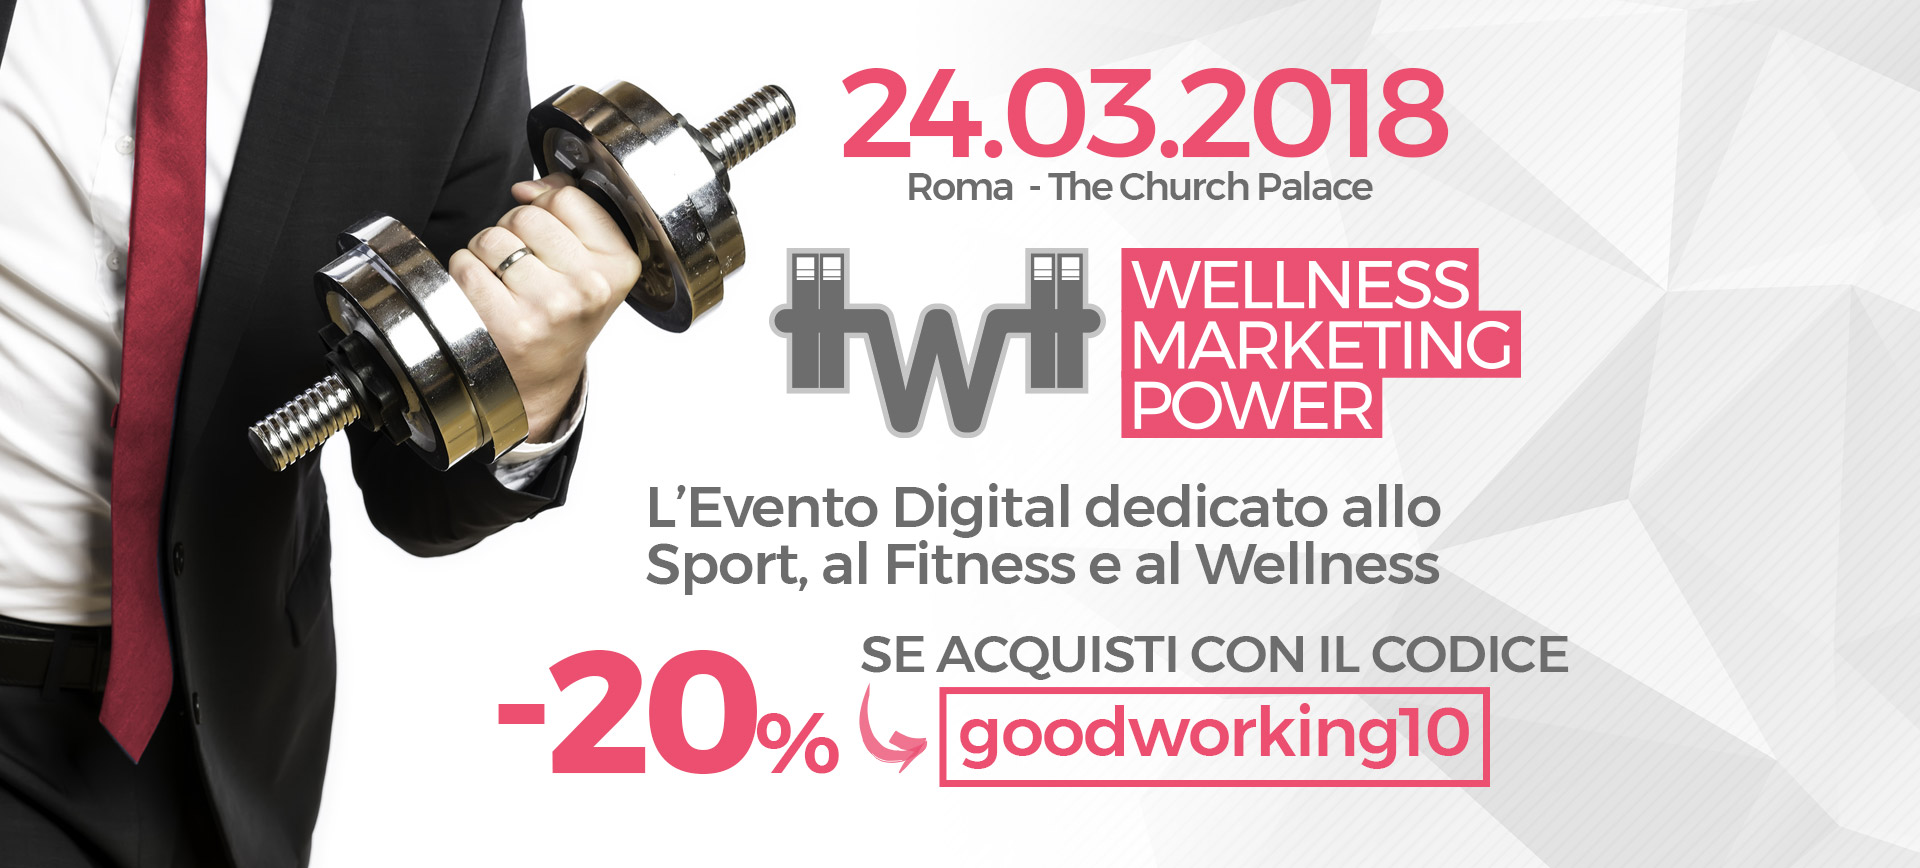 Evento Wellness Marketing Power Roma